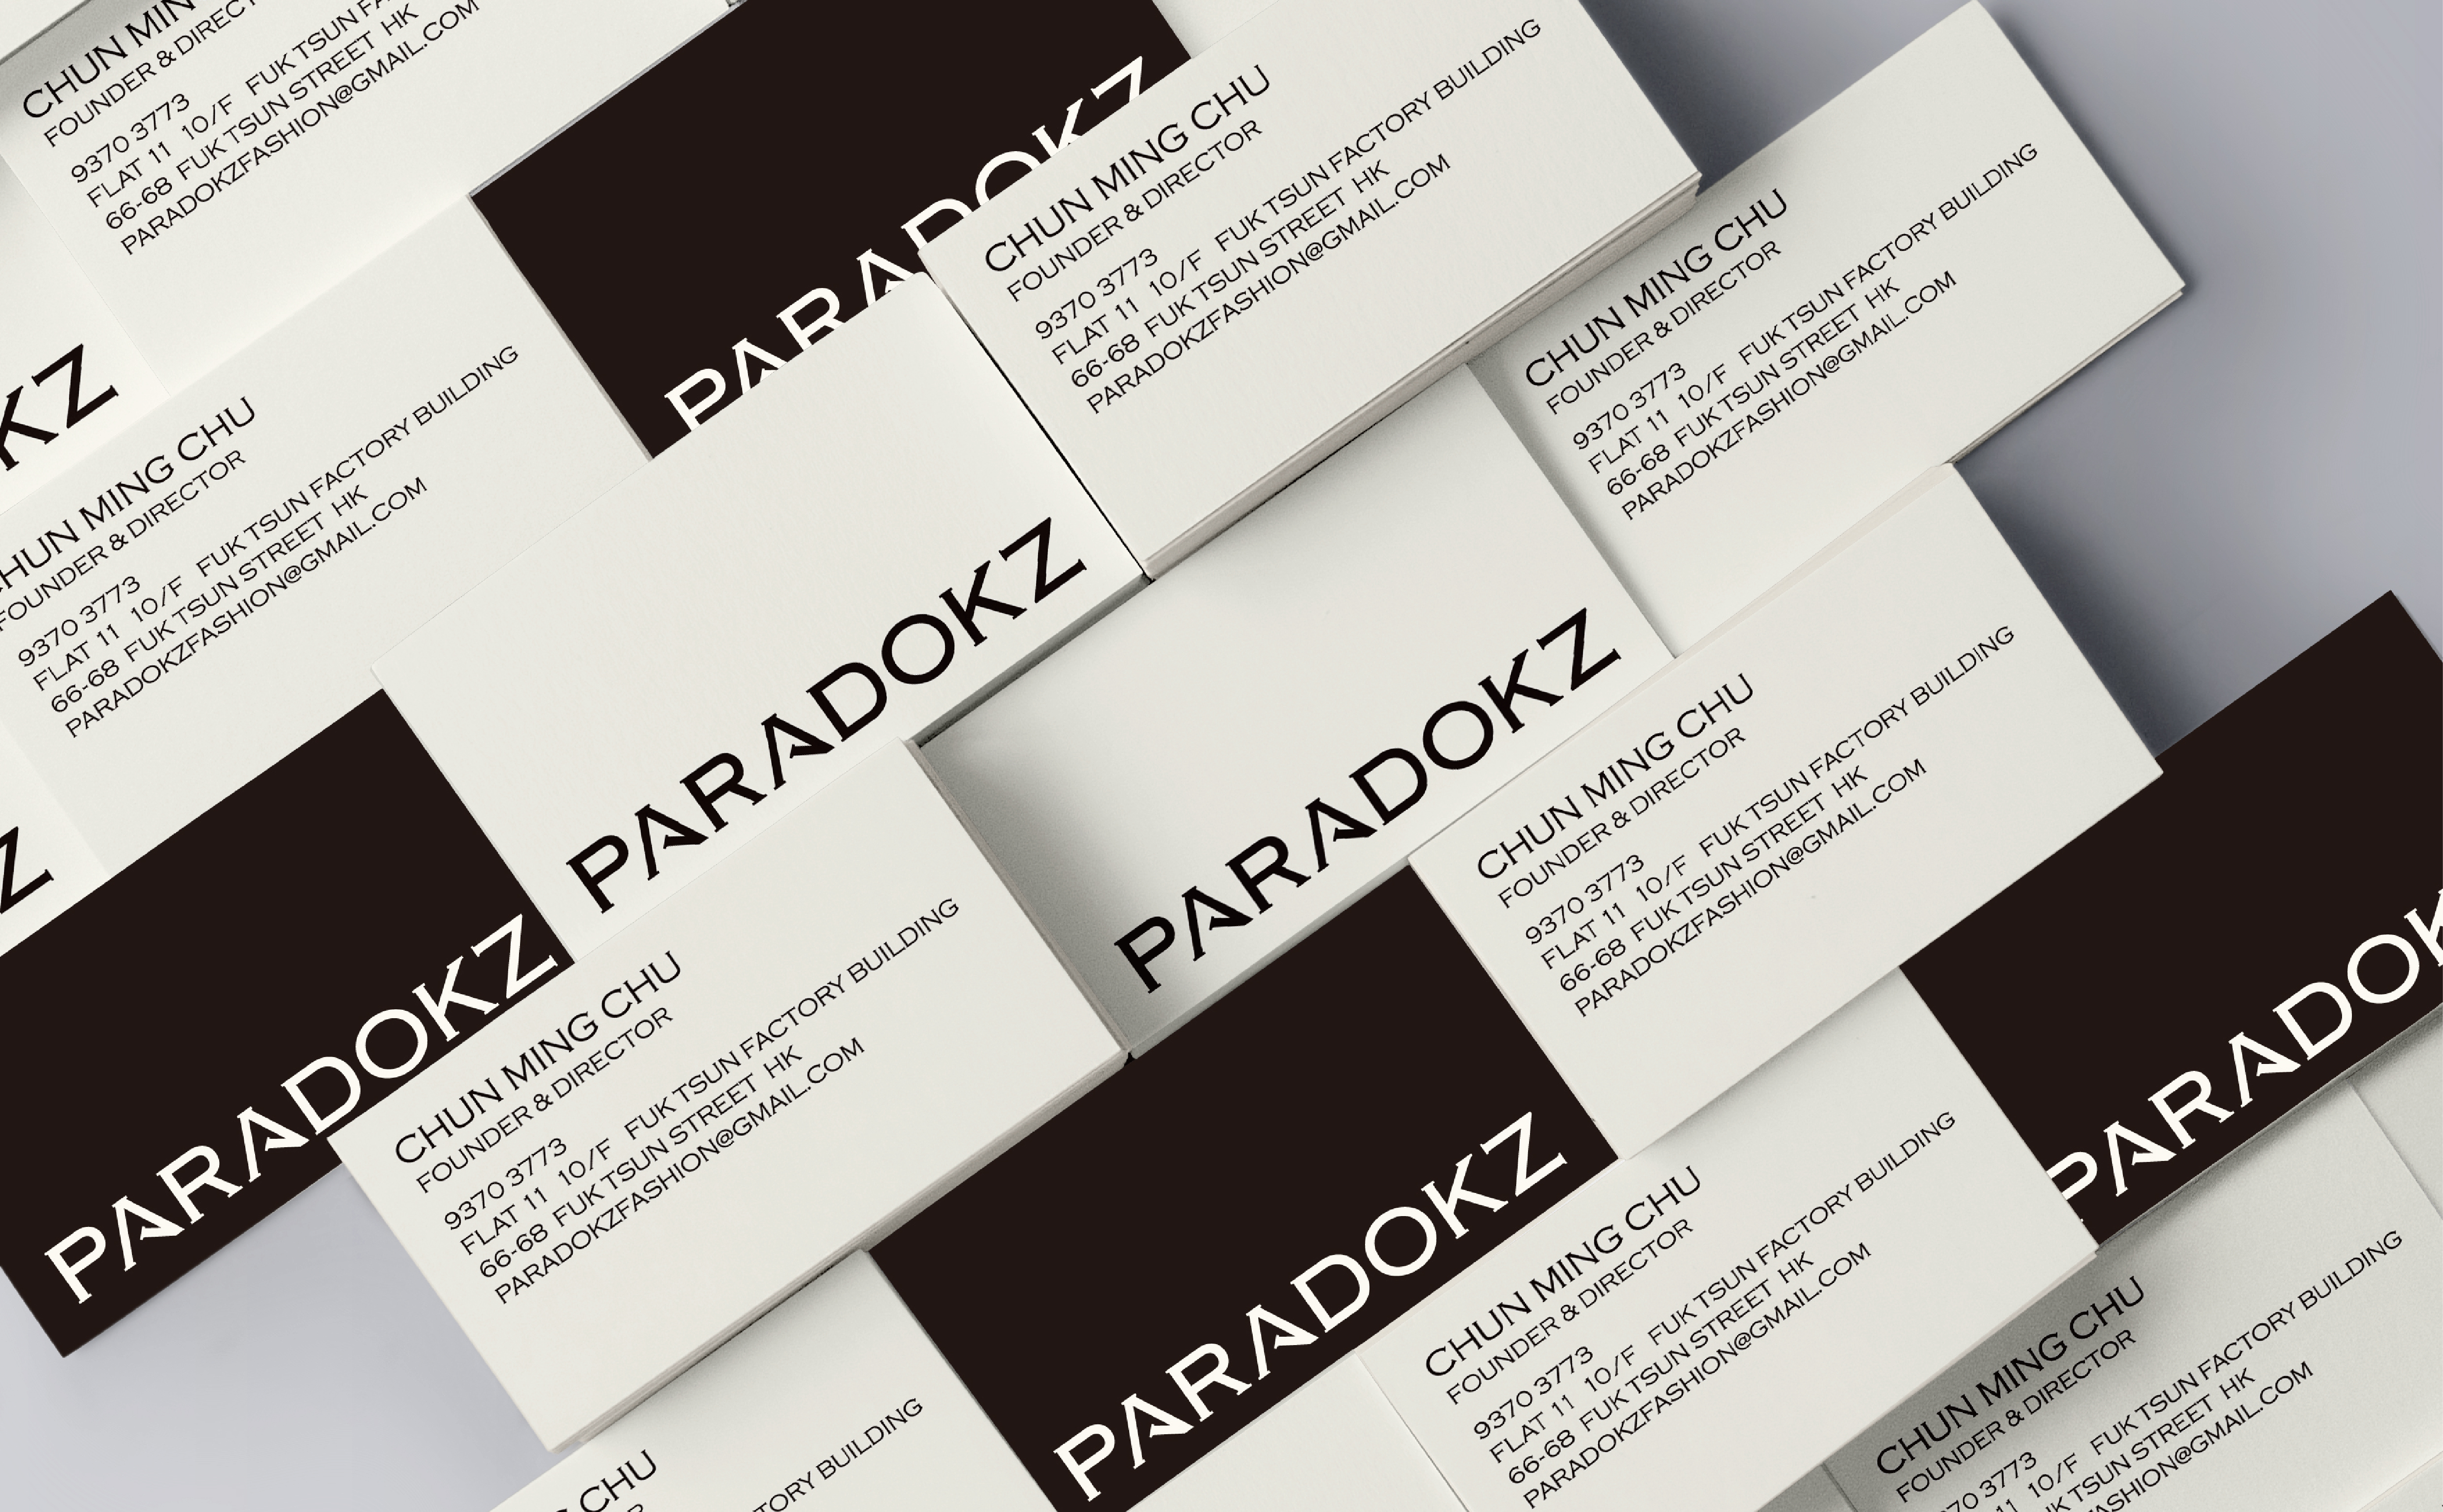 Paradokz